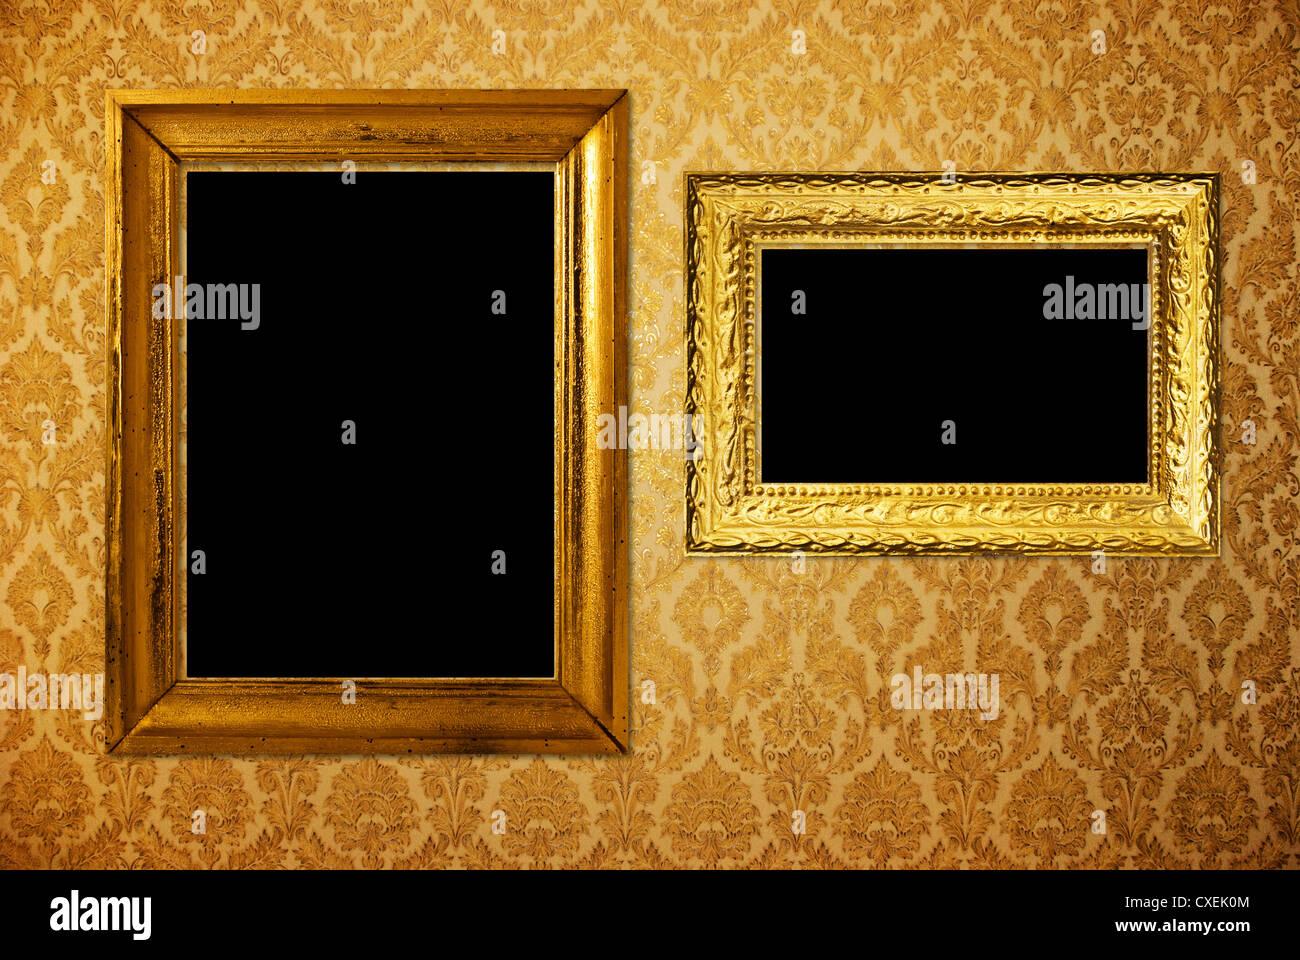 Vintage Frame Over Golden Wallpaper Stock Photo 50724036 Alamy